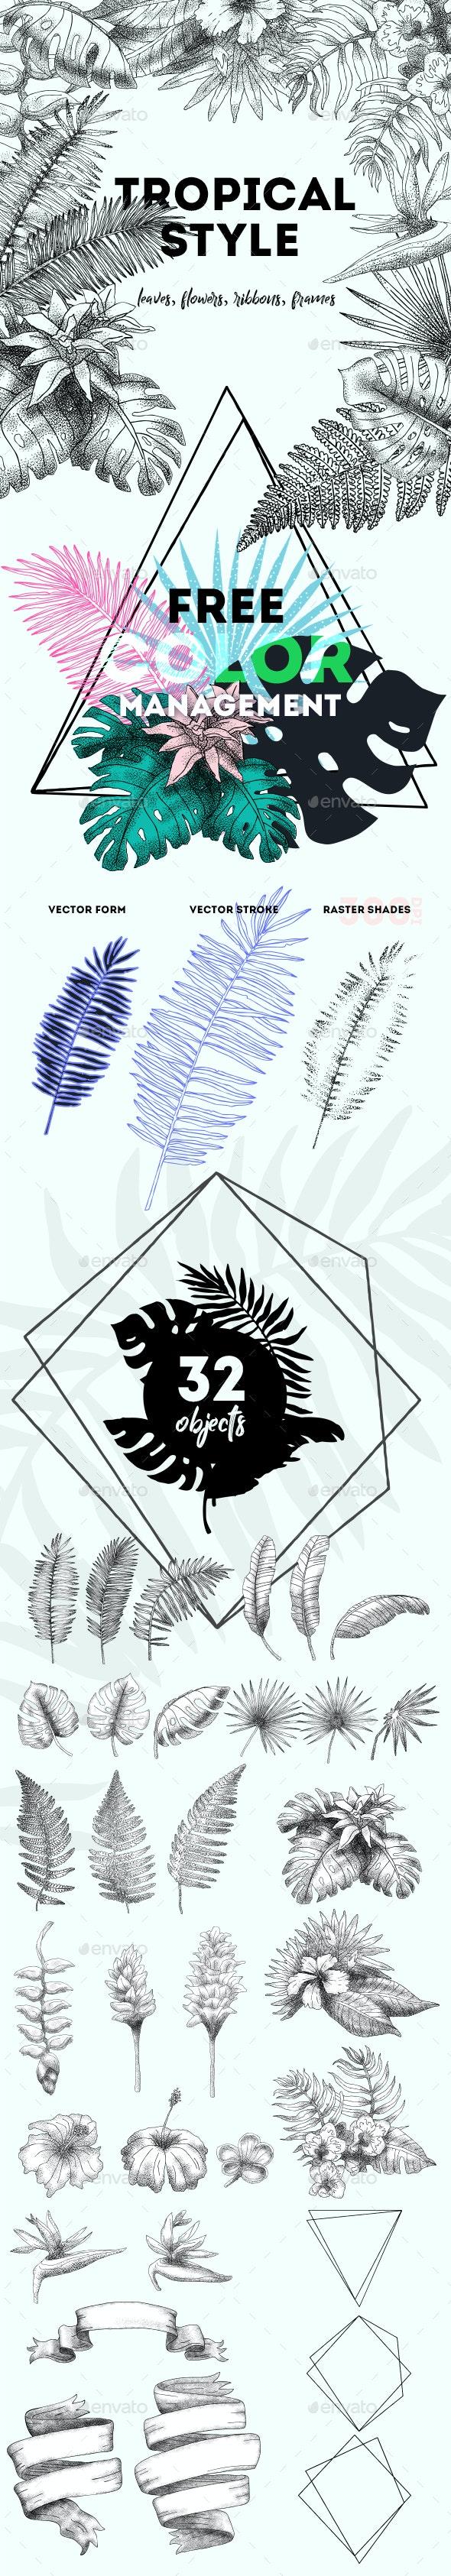 Tropical Style Elements Set. vol.-01 - Flourishes / Swirls Decorative